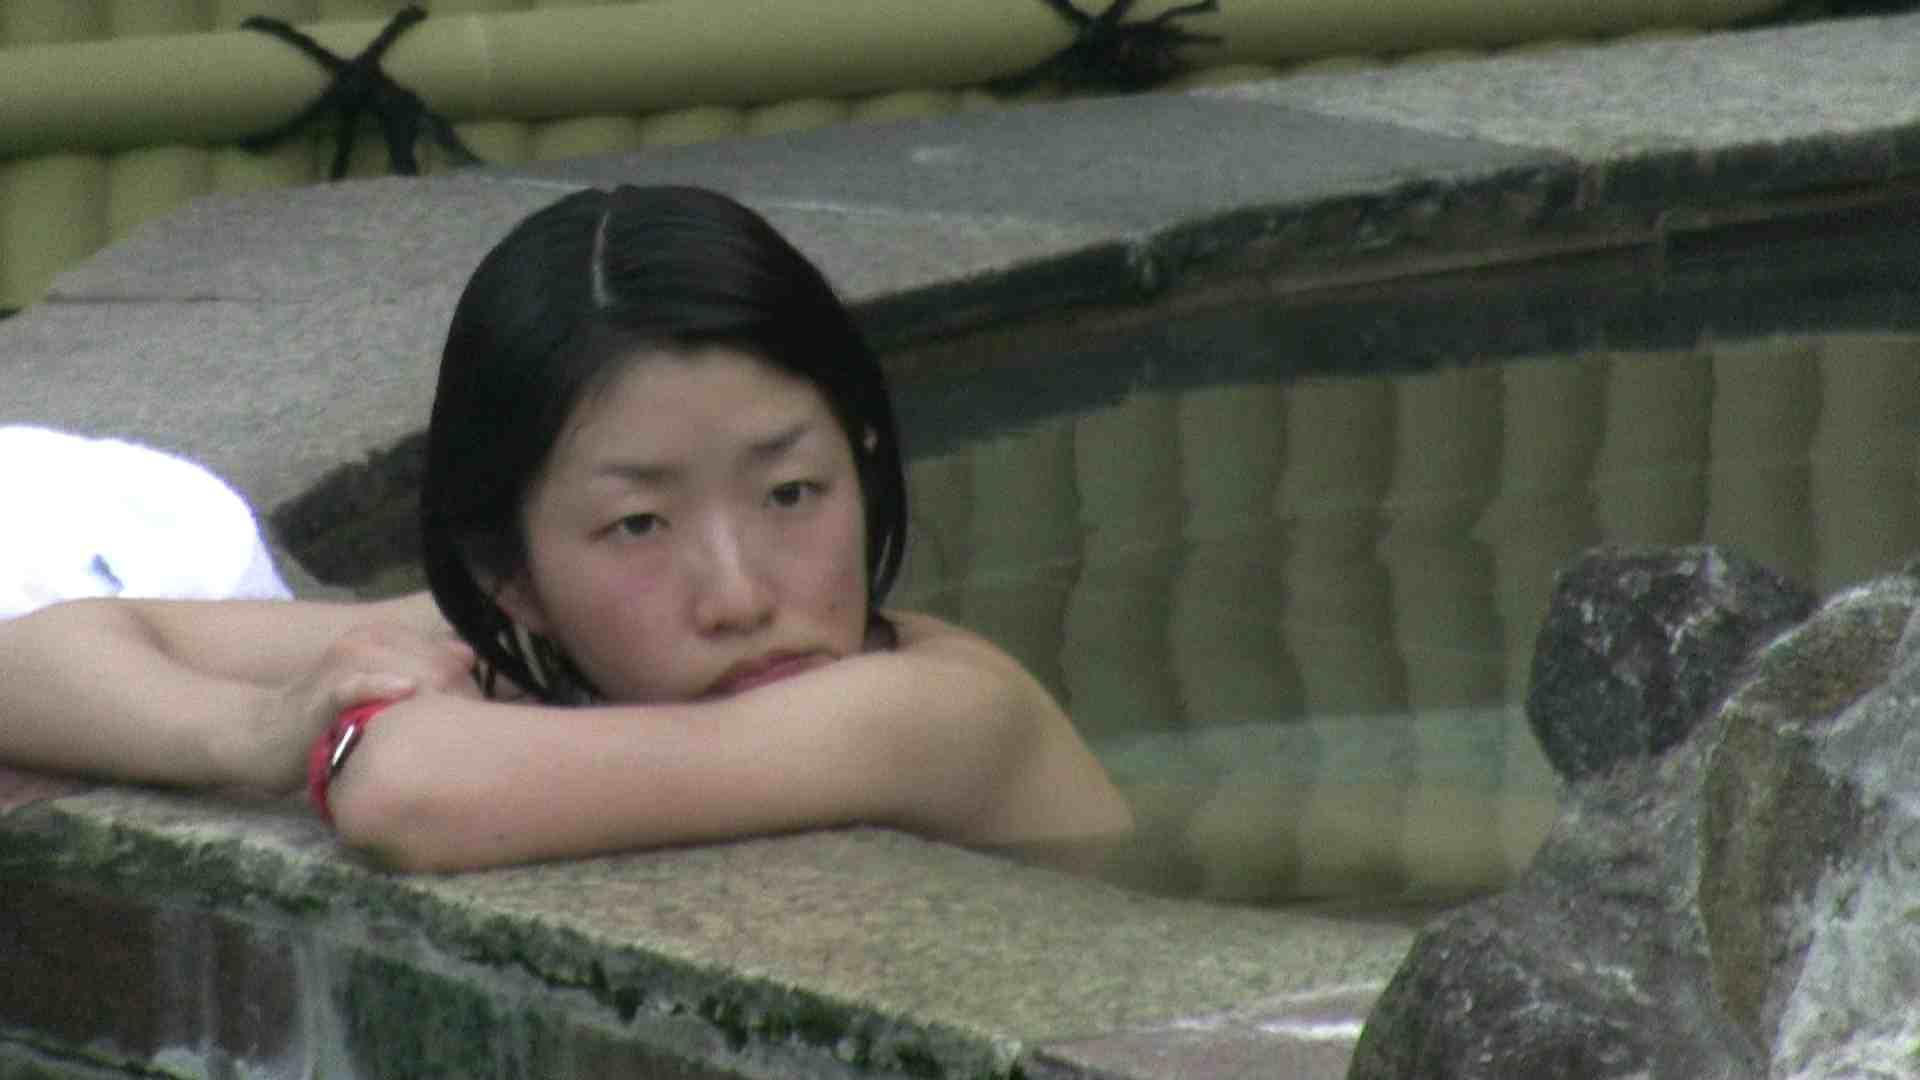 Aquaな露天風呂Vol.133 0 | 0  46連発 39